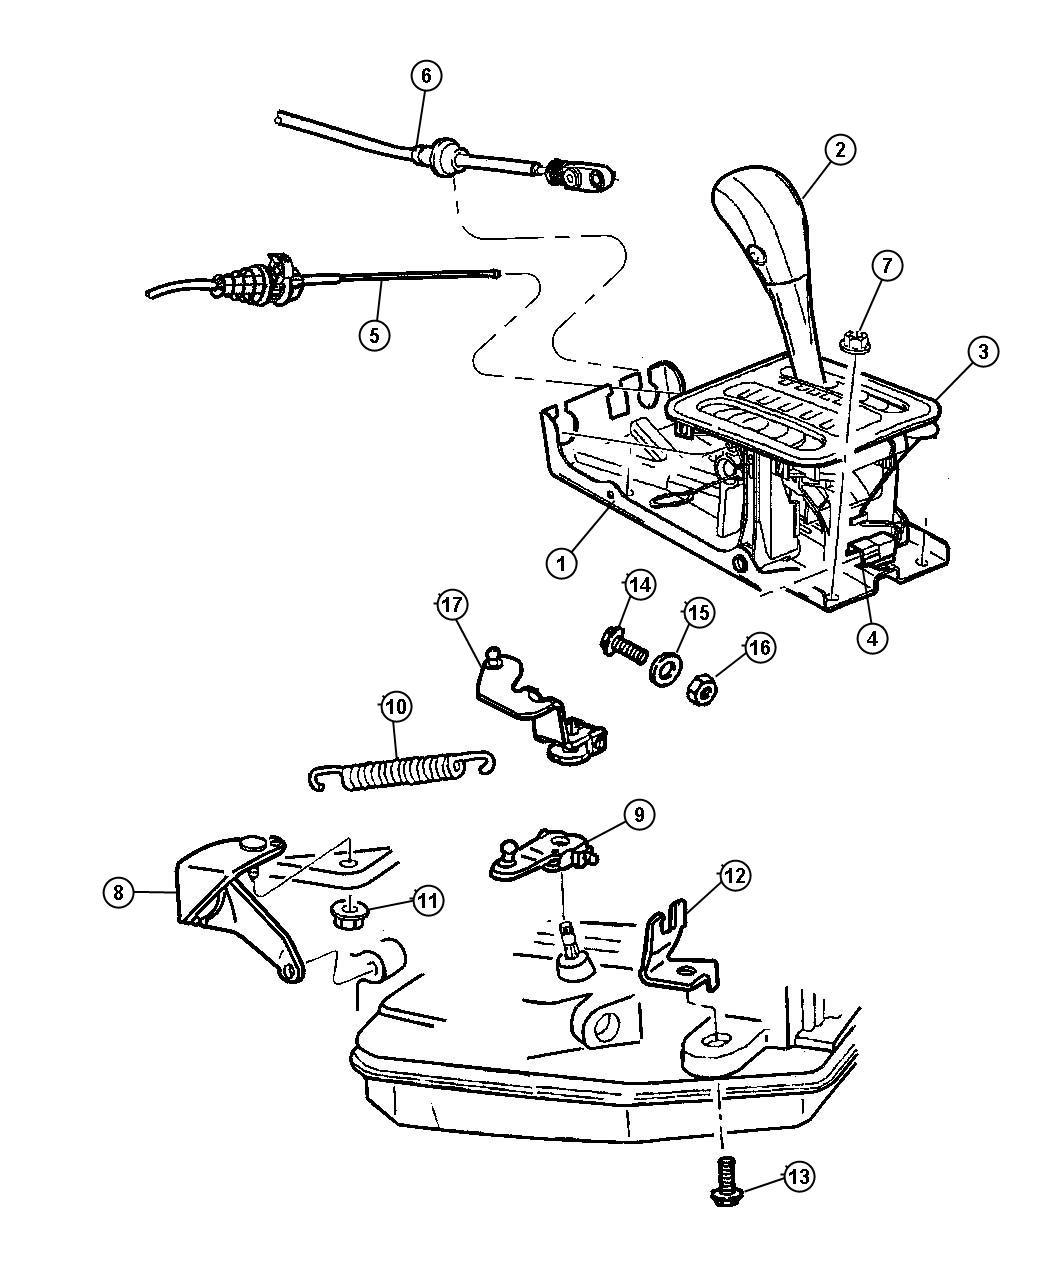 Plymouth Prowler Bezel Gear Shift Indicator